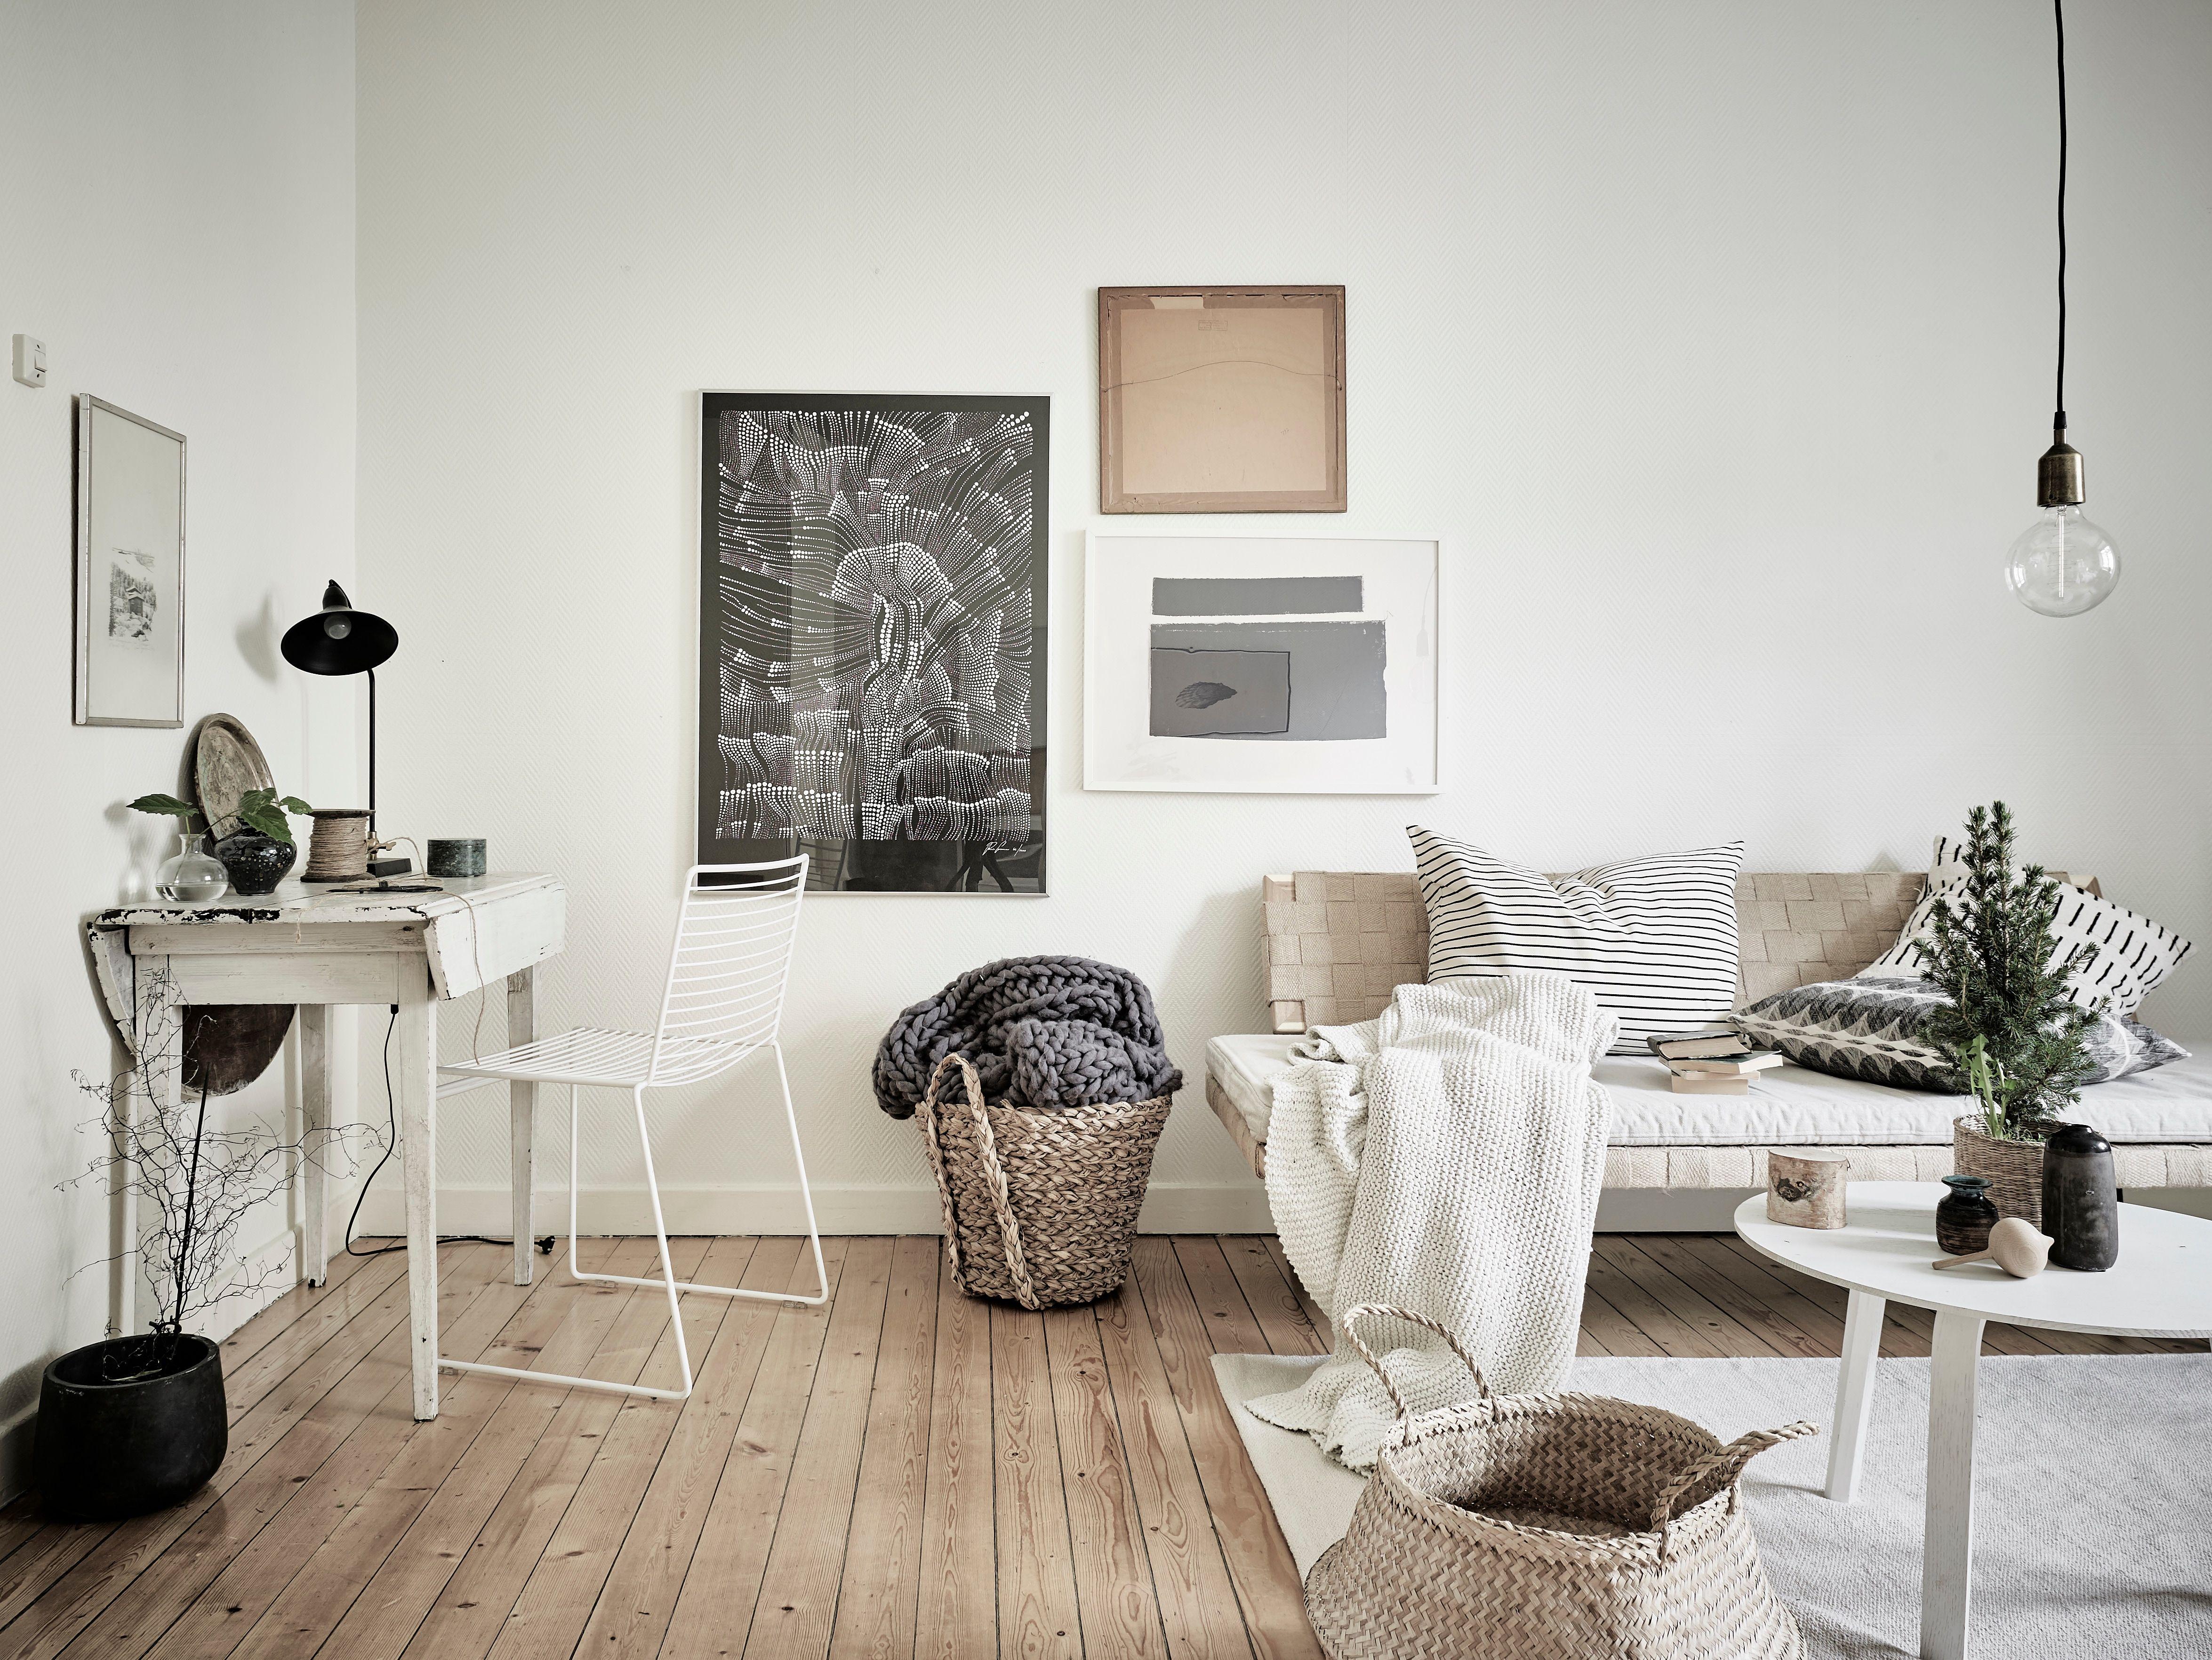 Scandinavian Design Is More Than Just Ikea Living Room Scandinavian Scandinavian Home Interiors Scandinavian Design Living Room